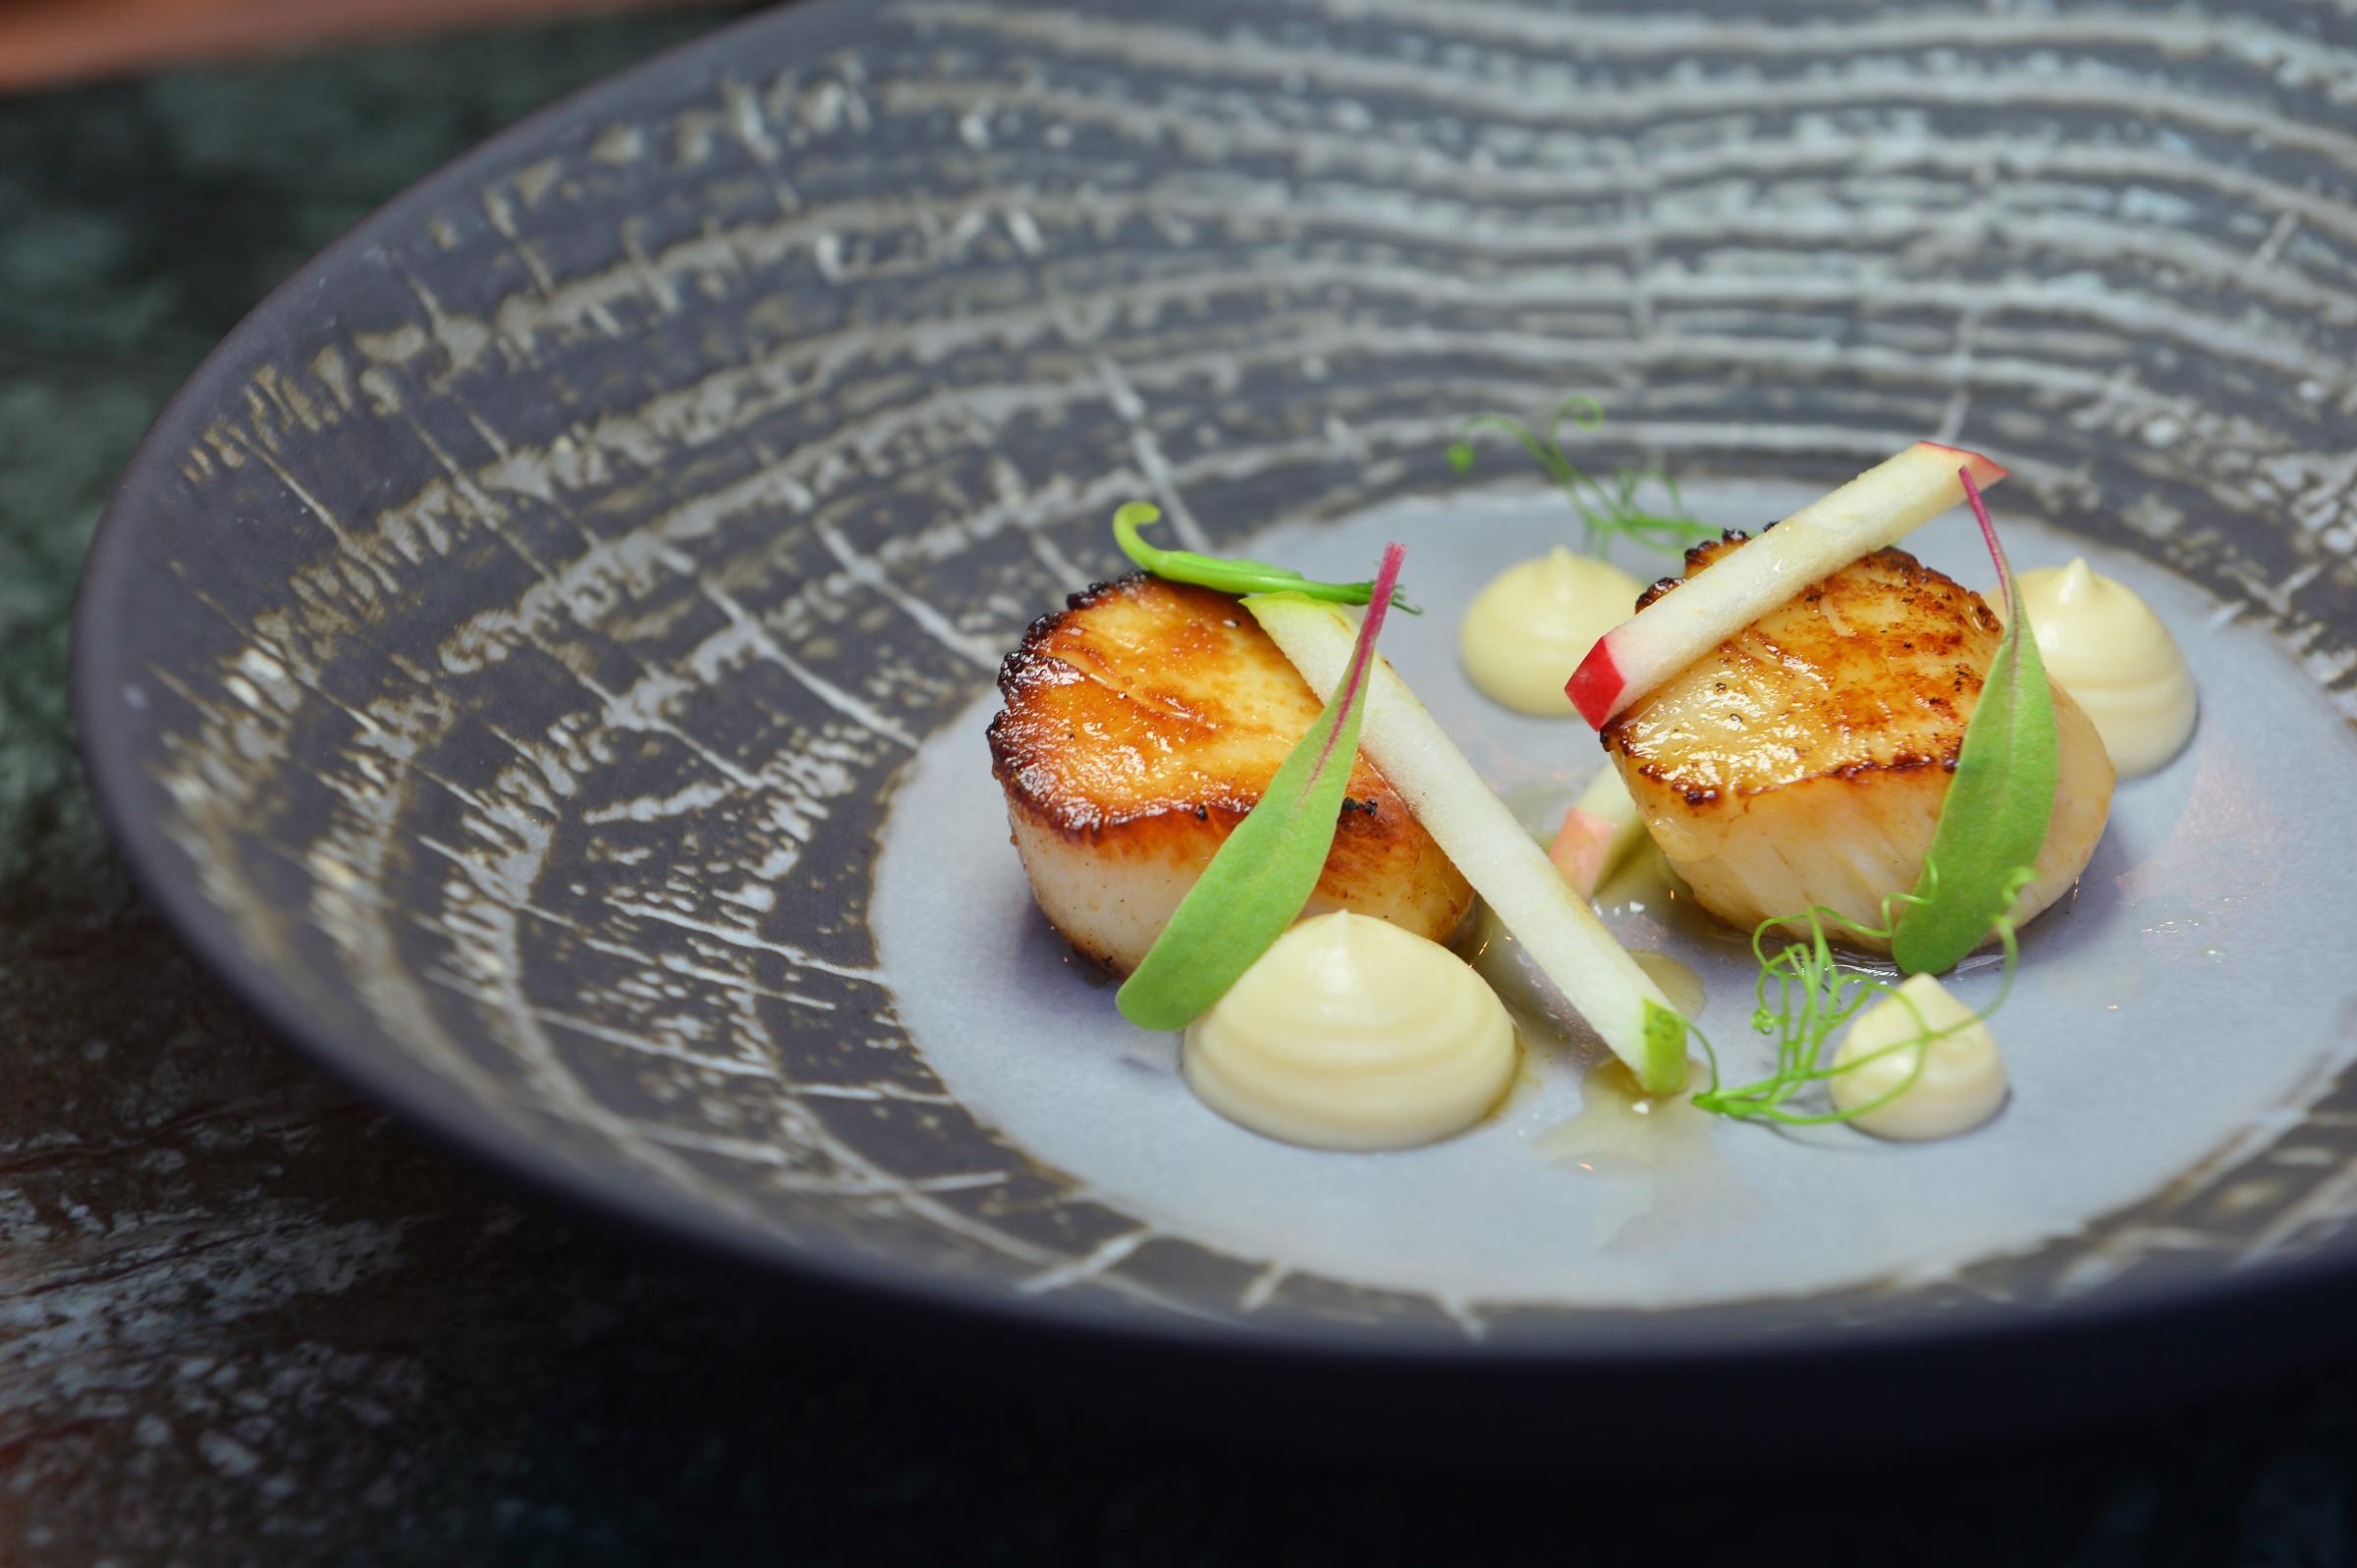 Recipe of the Day: Hand-dived Scottish scallops, celeriac, apple and truffle by Simon Attridge, executive chef at Gleneagles